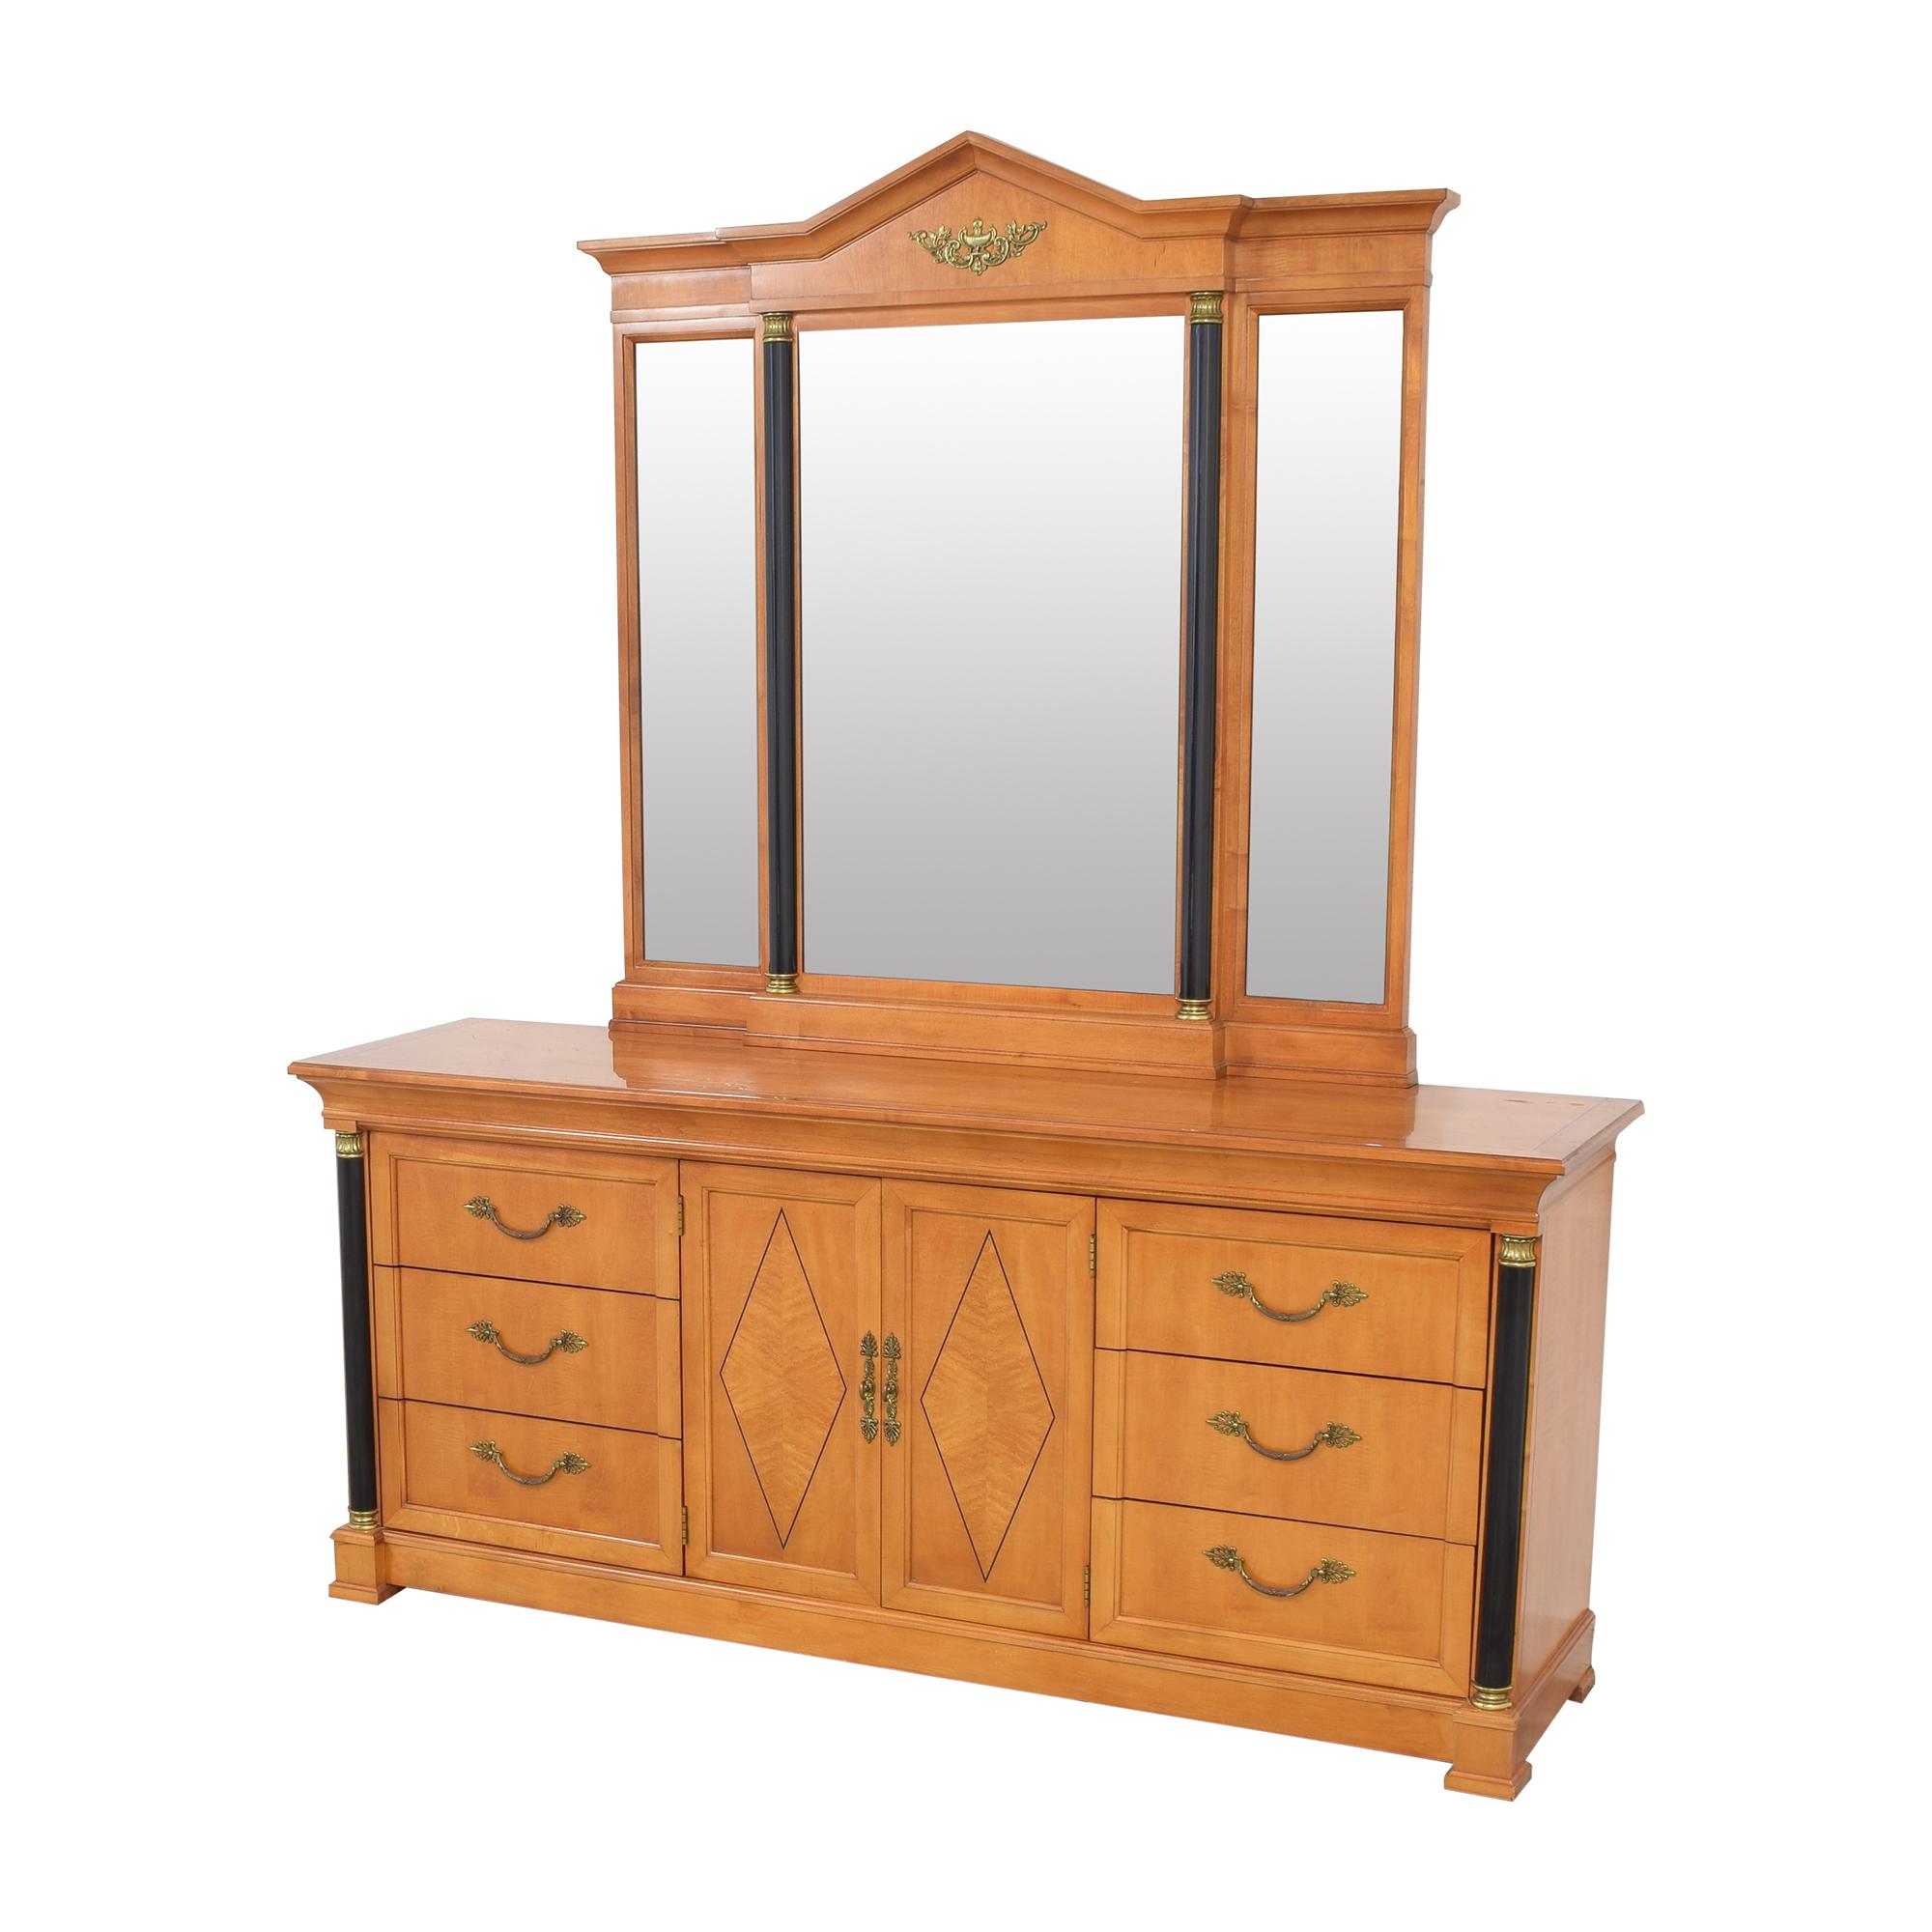 Thomasville Thomasville Grand Classics Biedermeier Triple Dresser with Mirror on sale